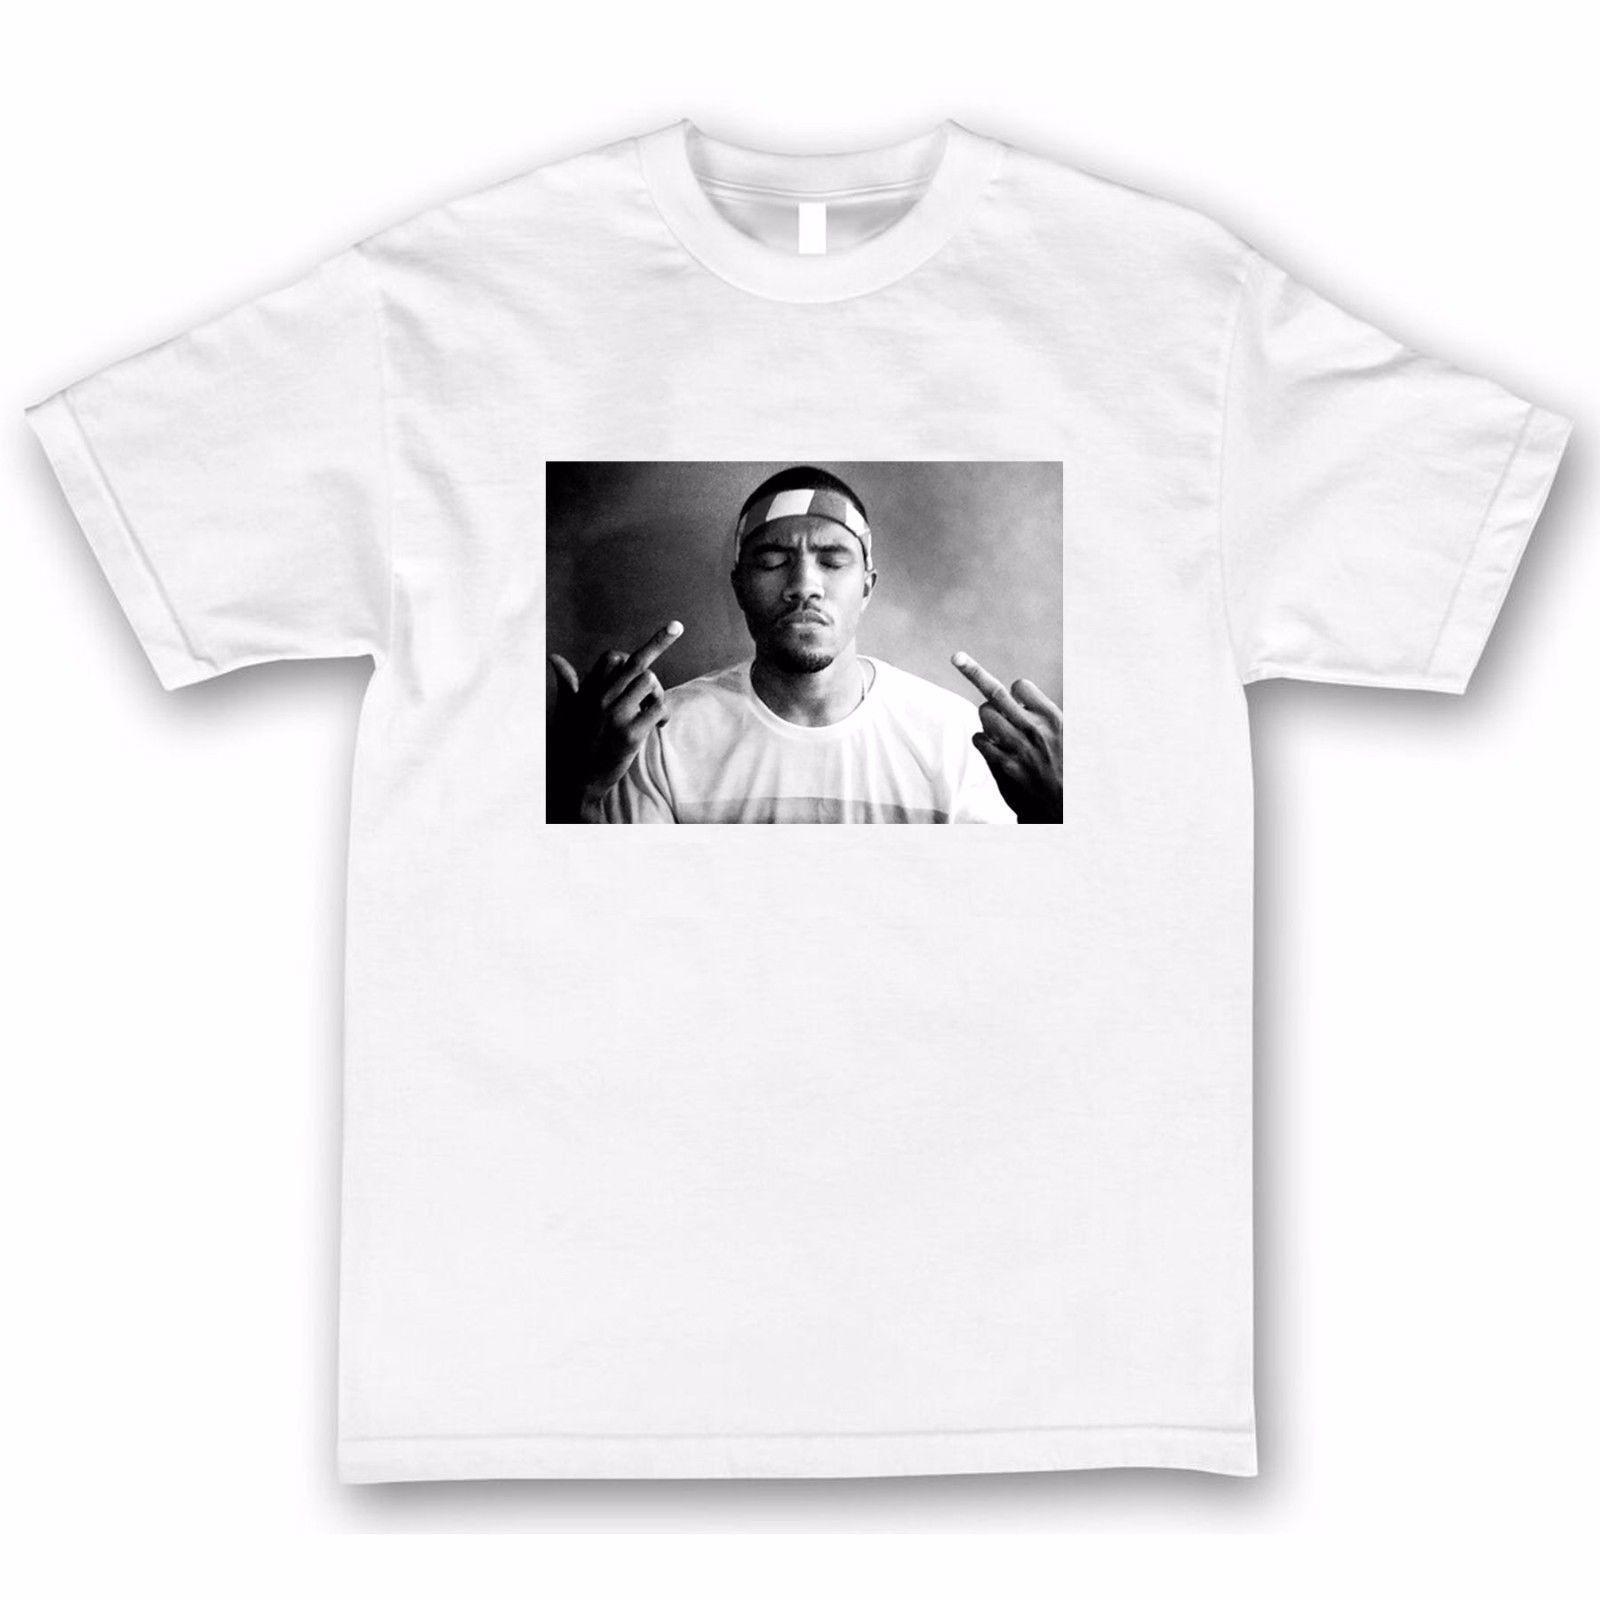 535c0d63 Frank Ocean T Shirt Boys Don'T Cry Blonde Blond Trapsoul Rap Hiphop New  Short Sleeves Cotton T-Shirt Top Tee